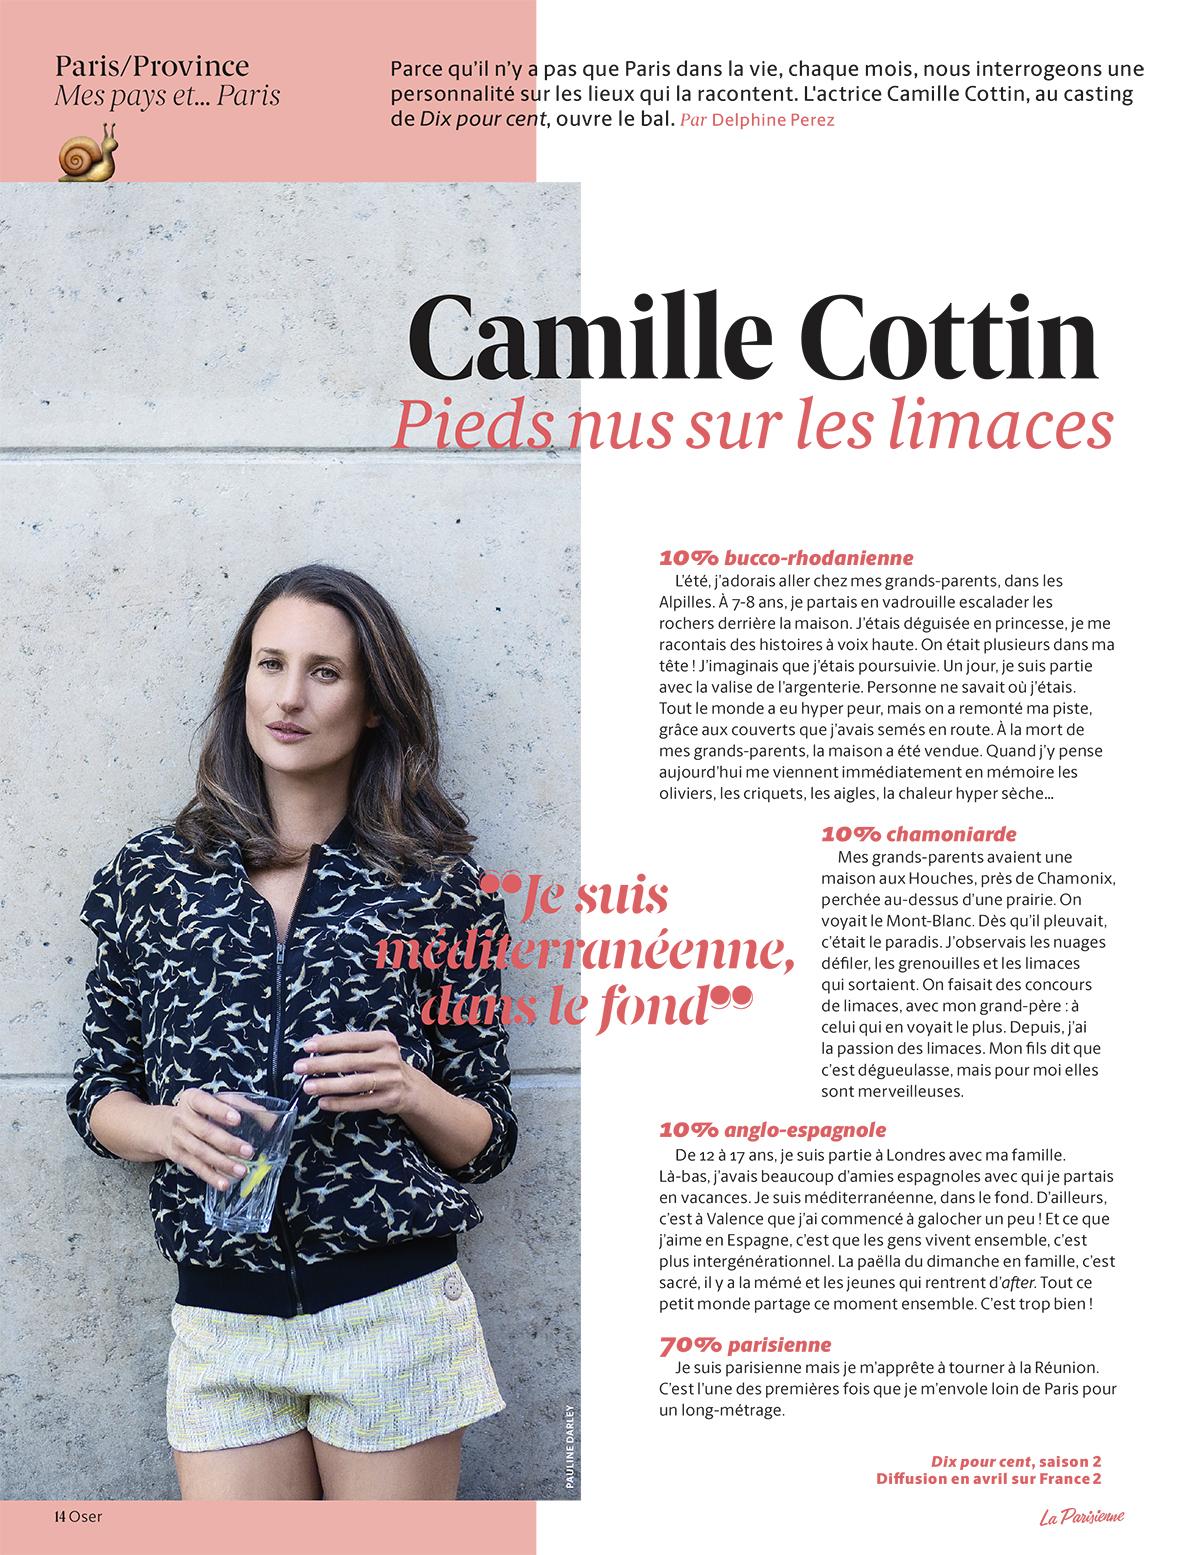 LP_01_1_PP_CamilleCottin_HRbd